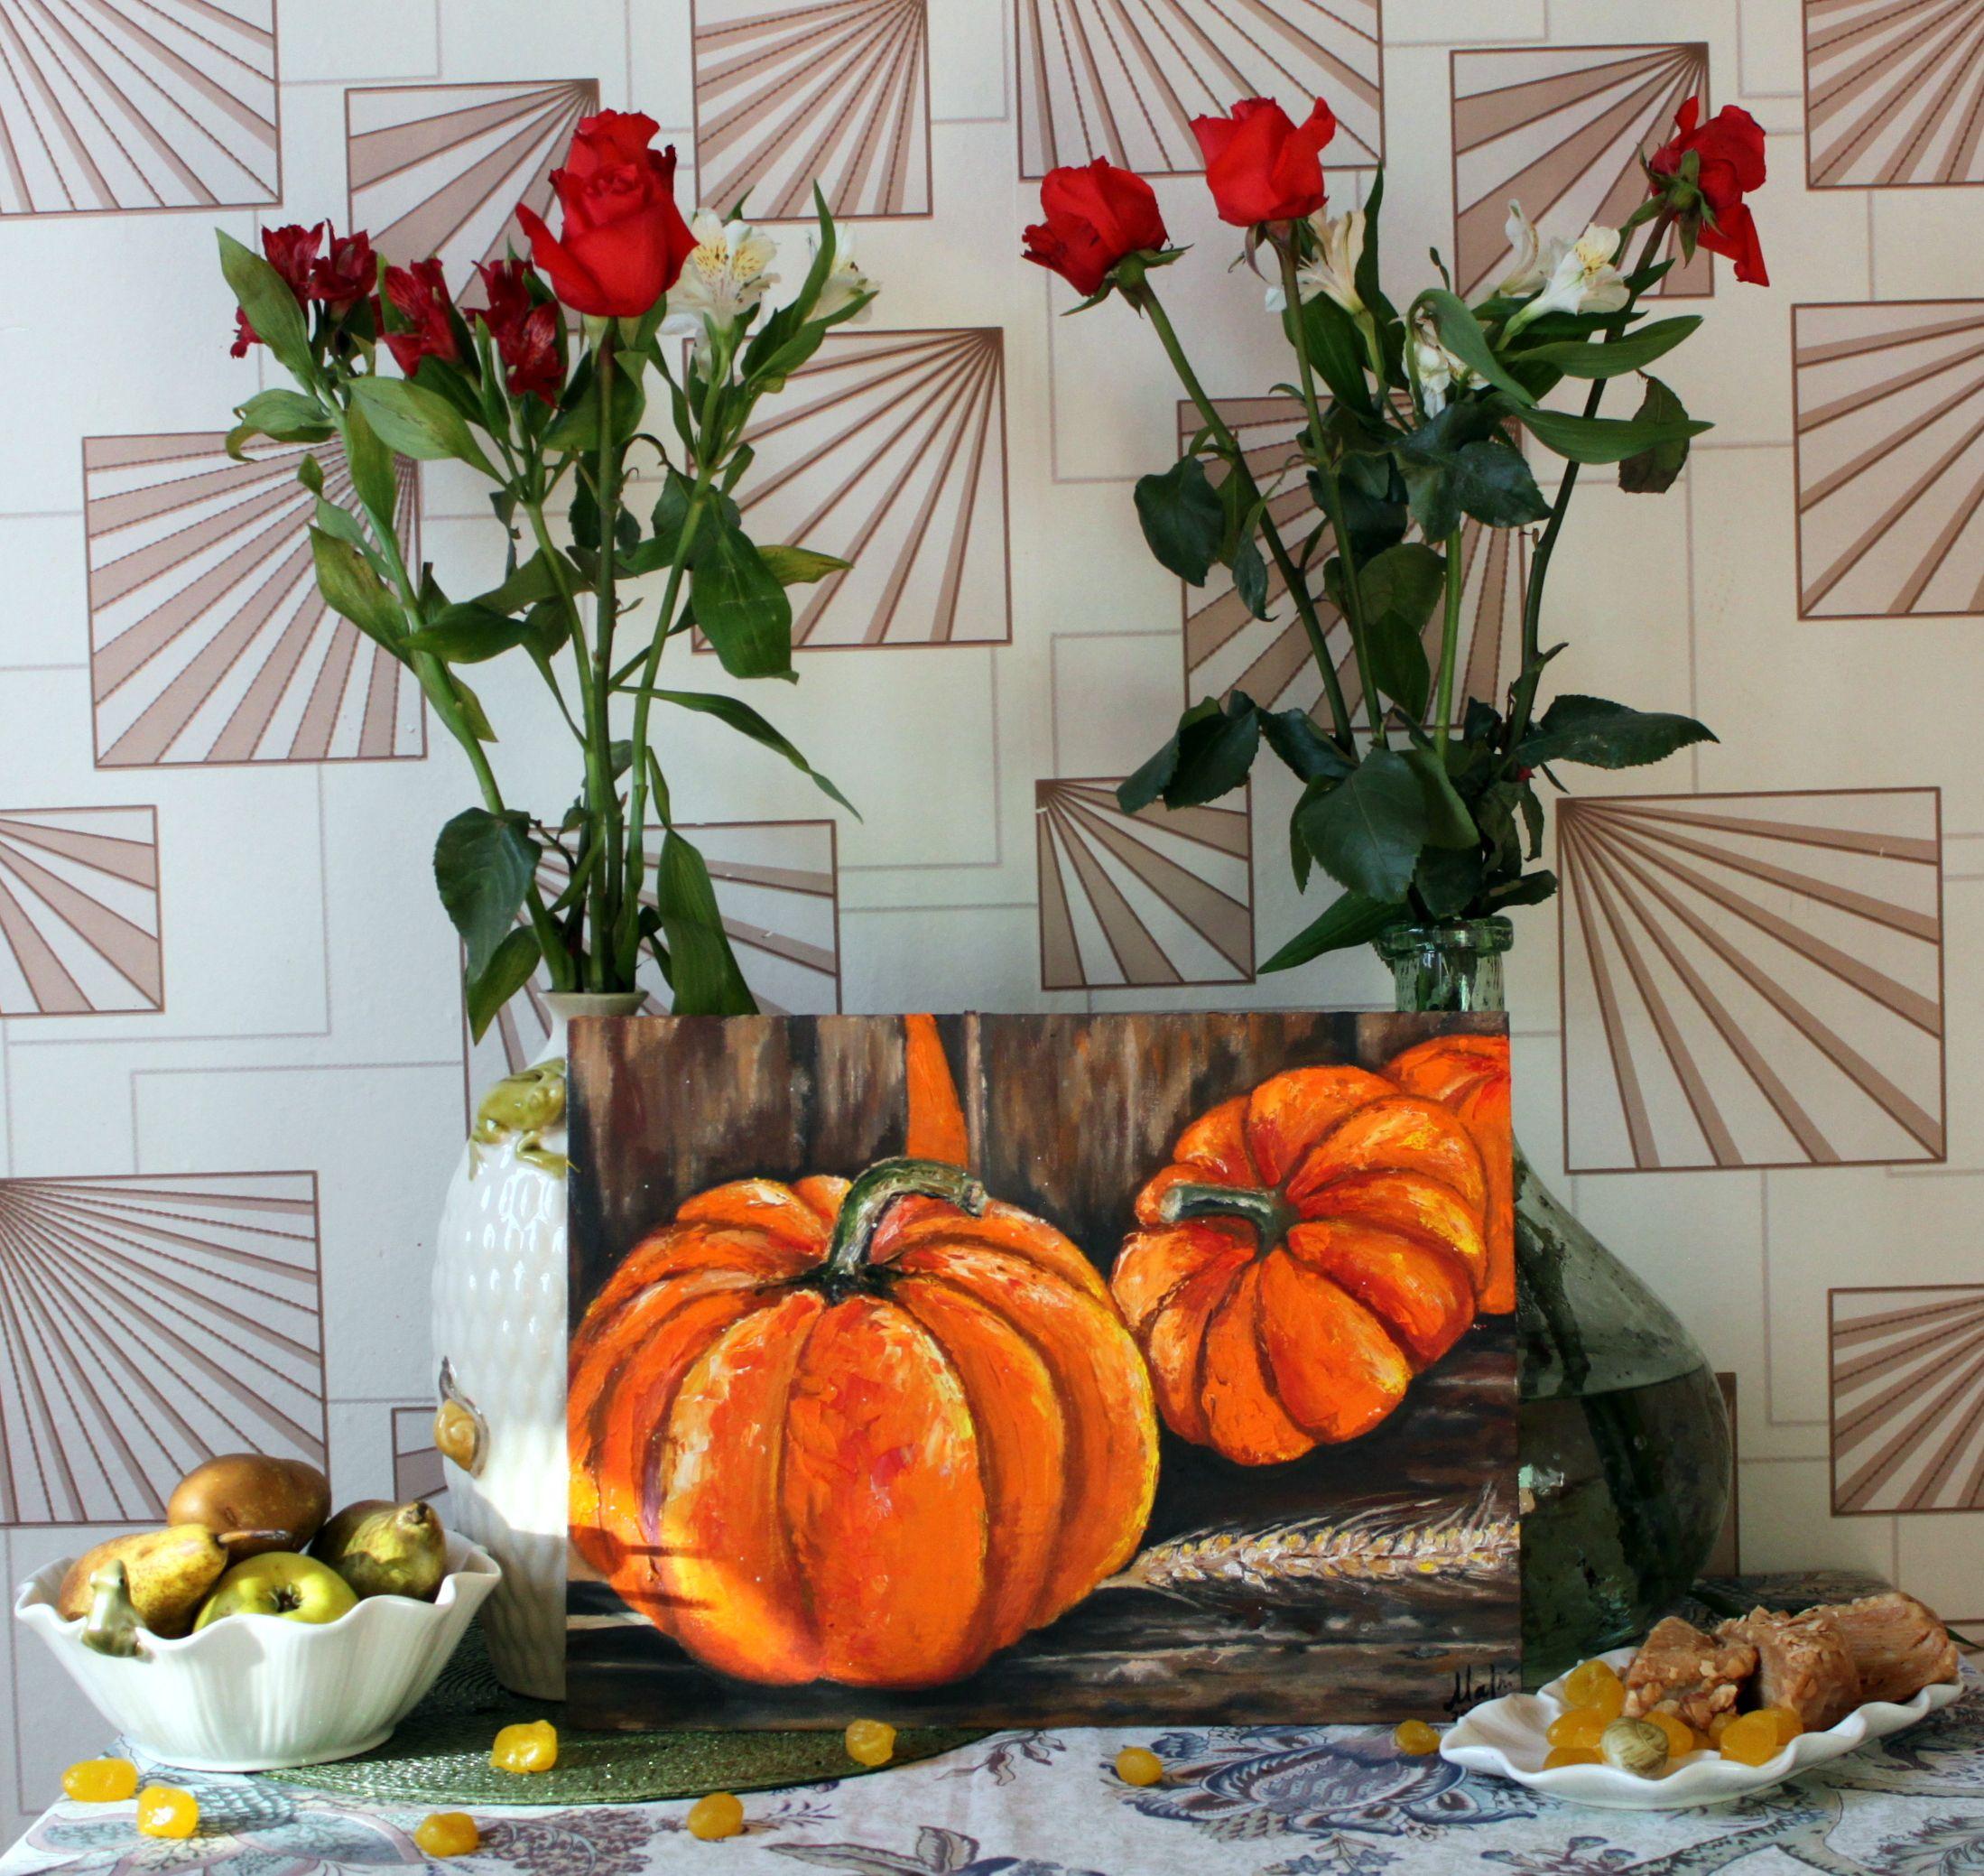 холст подарок картина масло осень тыква натюрморт